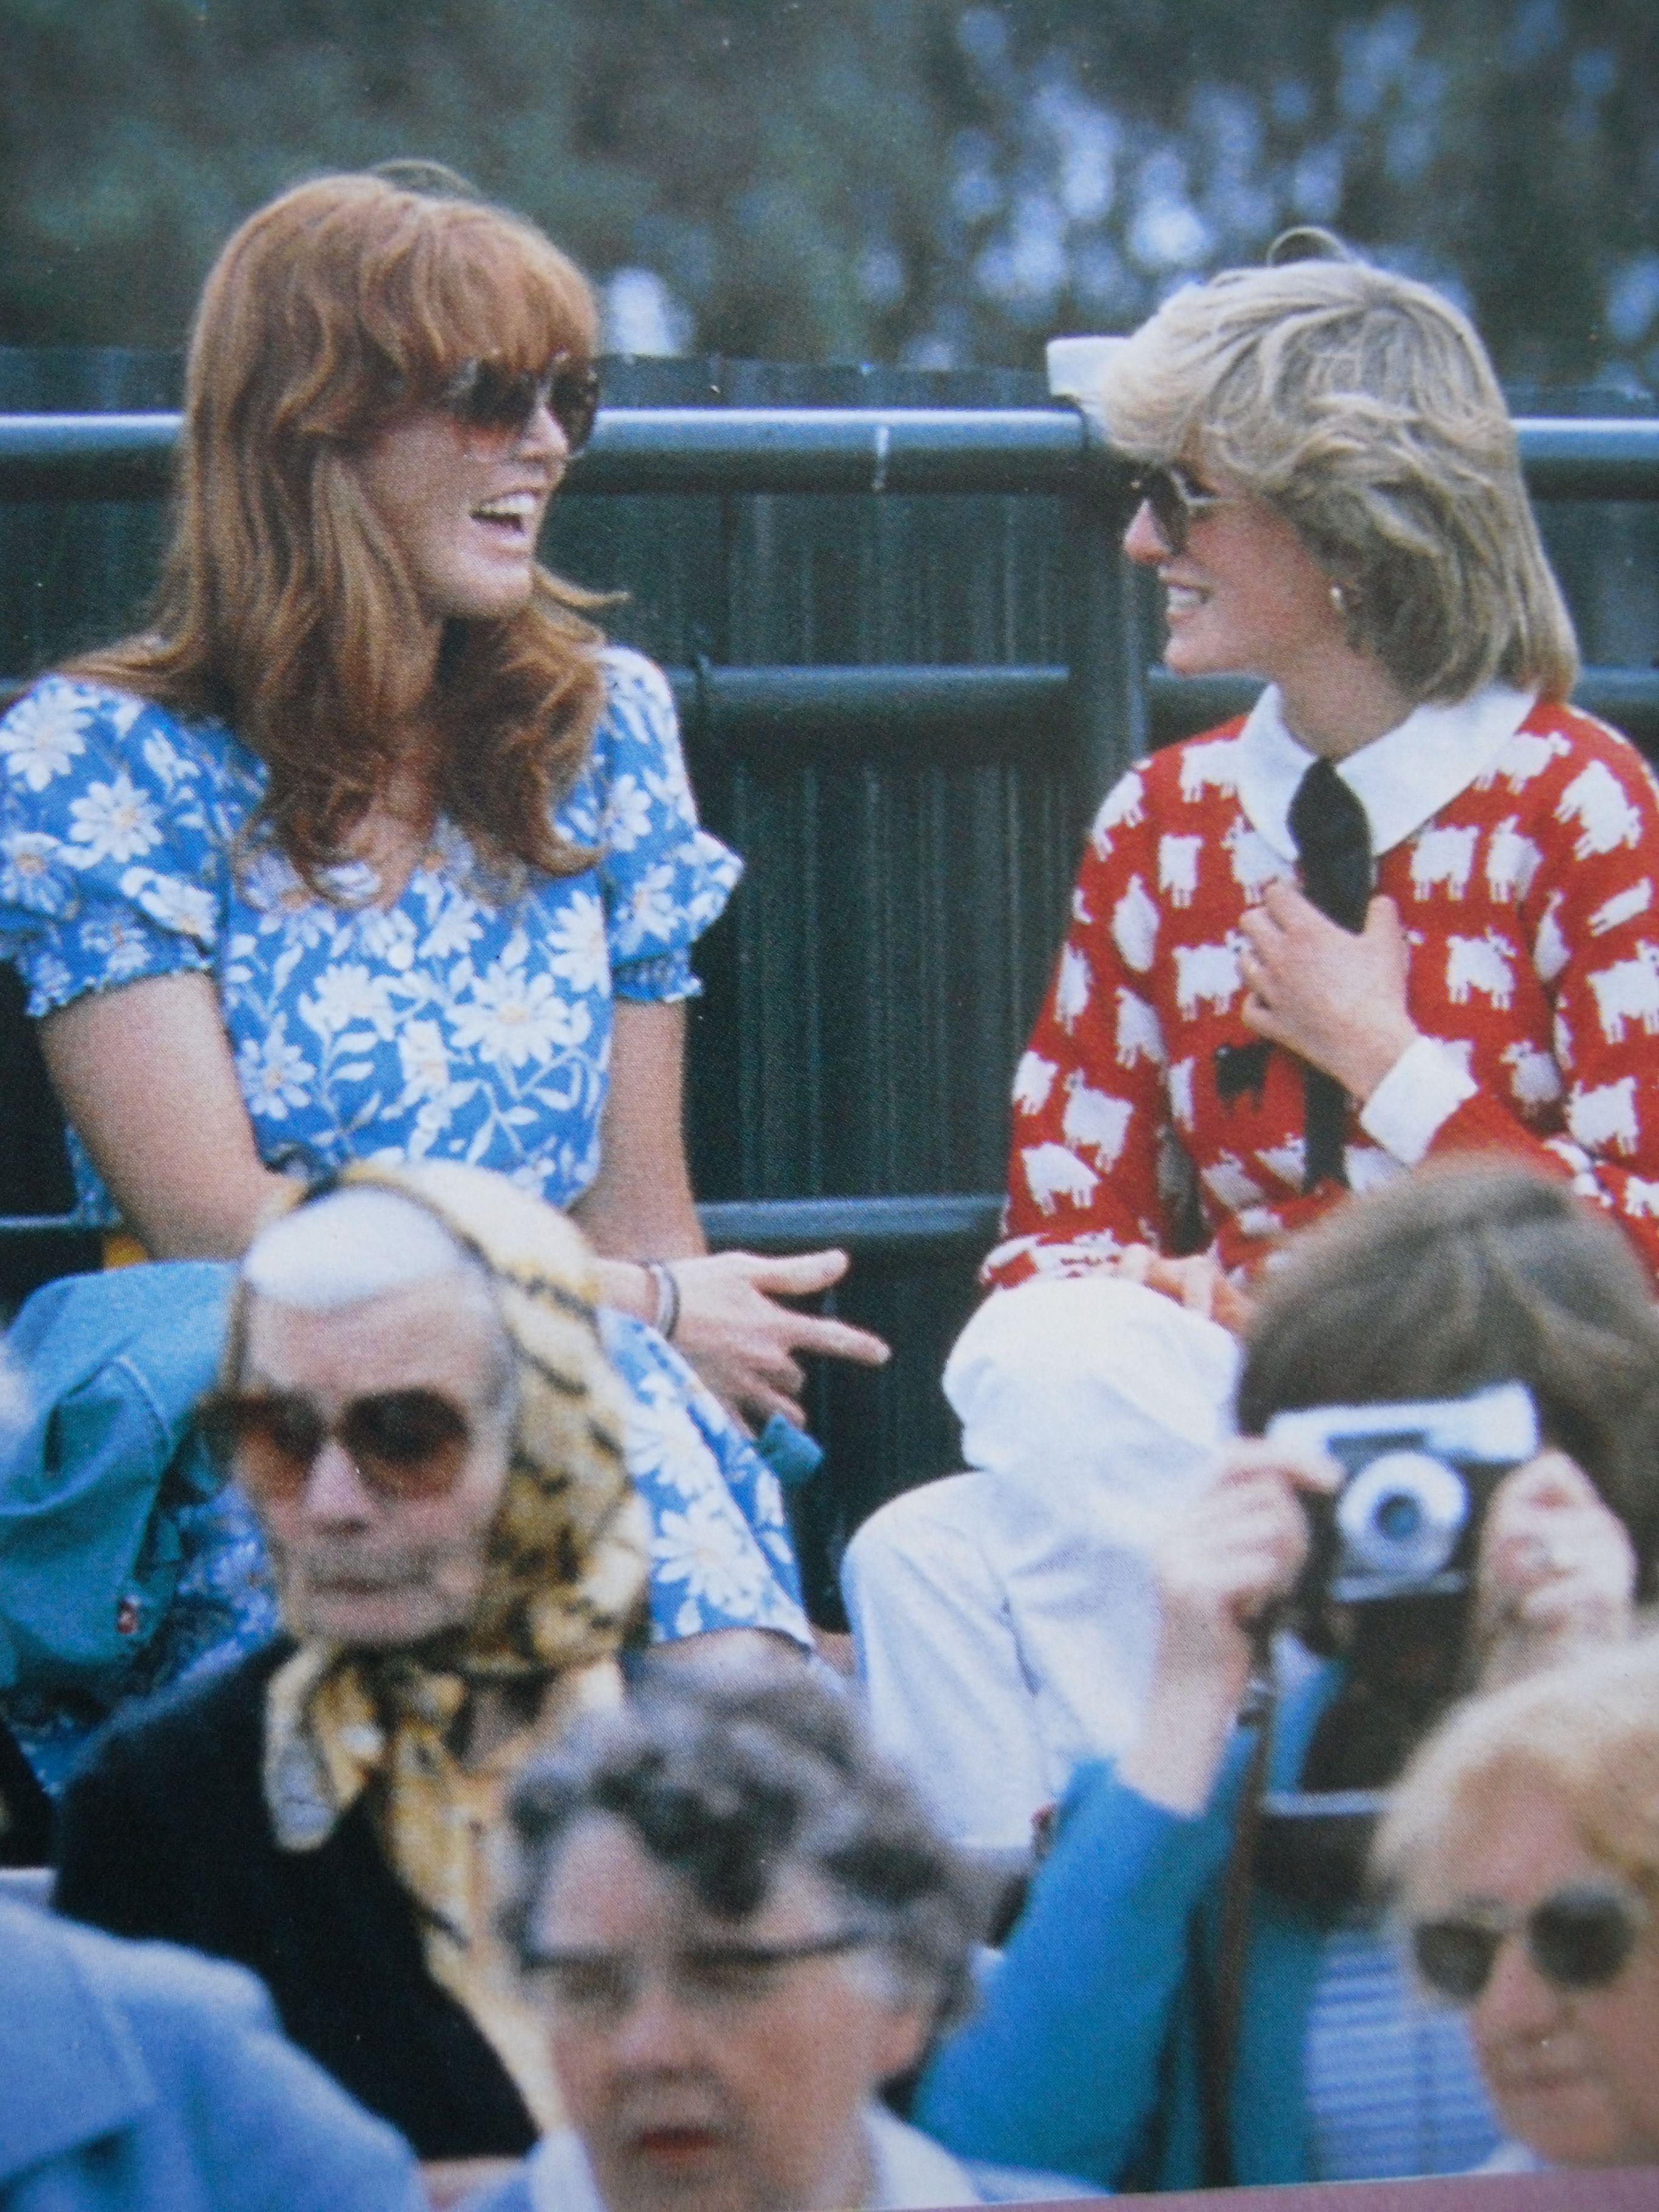 June 12, 1983 Princess Diana & her friend, Sarah Ferguson